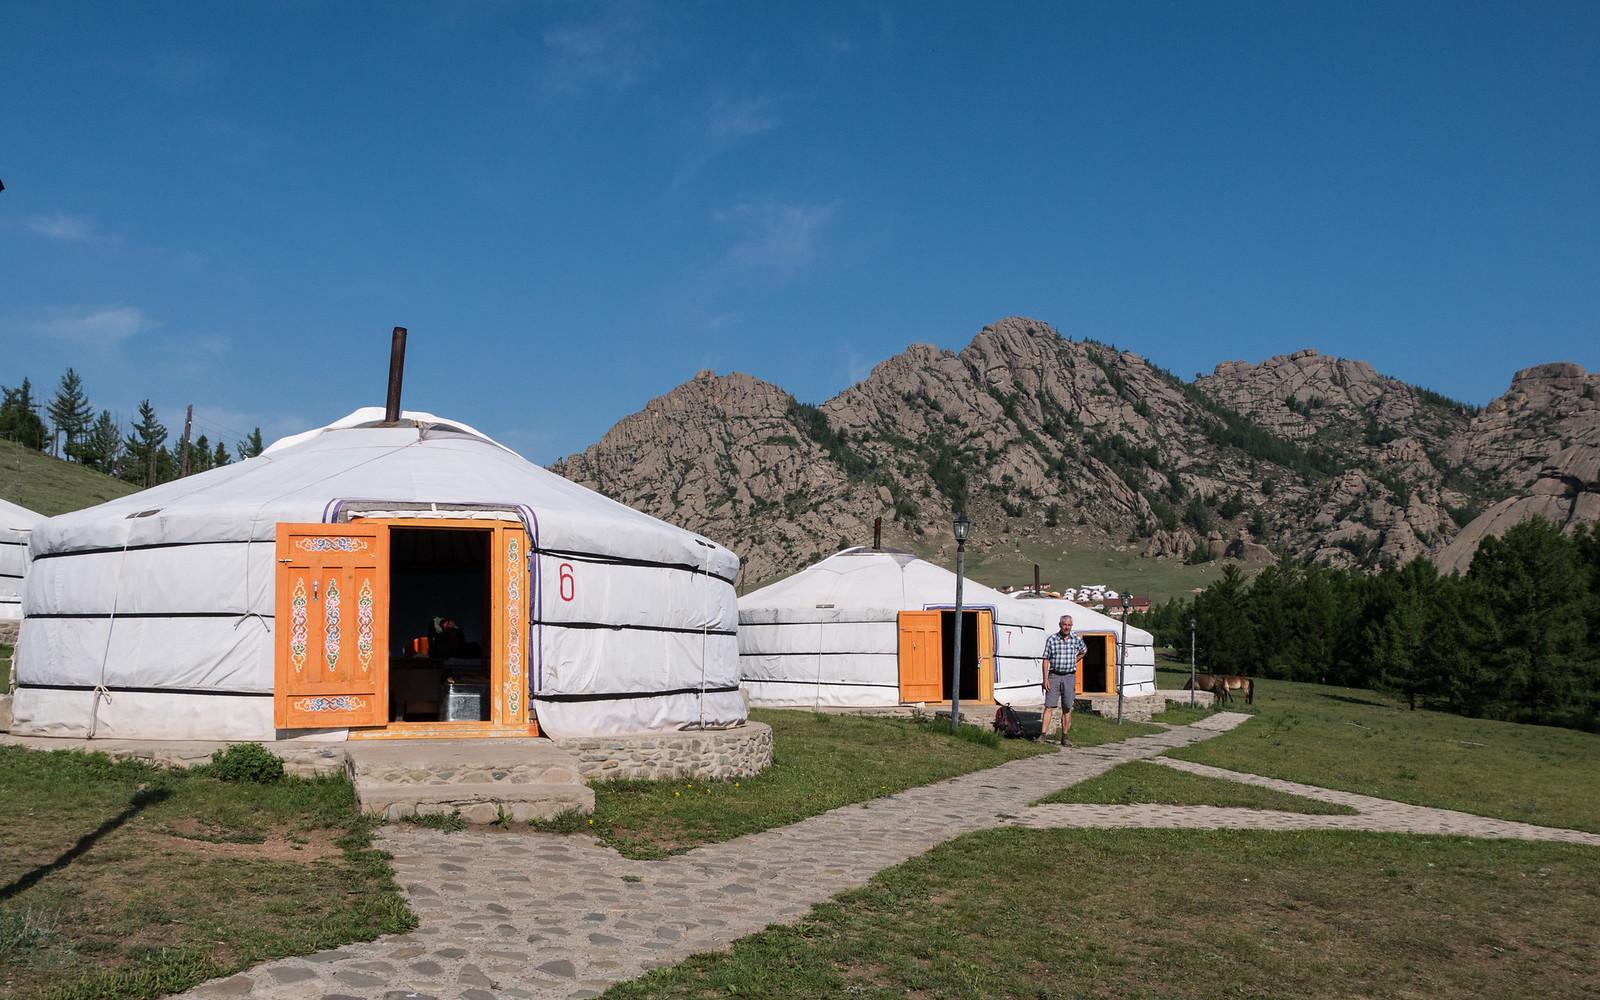 Tourist GER camp, Panasonic DMC-G80, Lumix G Vario 14-140mm F3.5-5.6 Asph. Power OIS